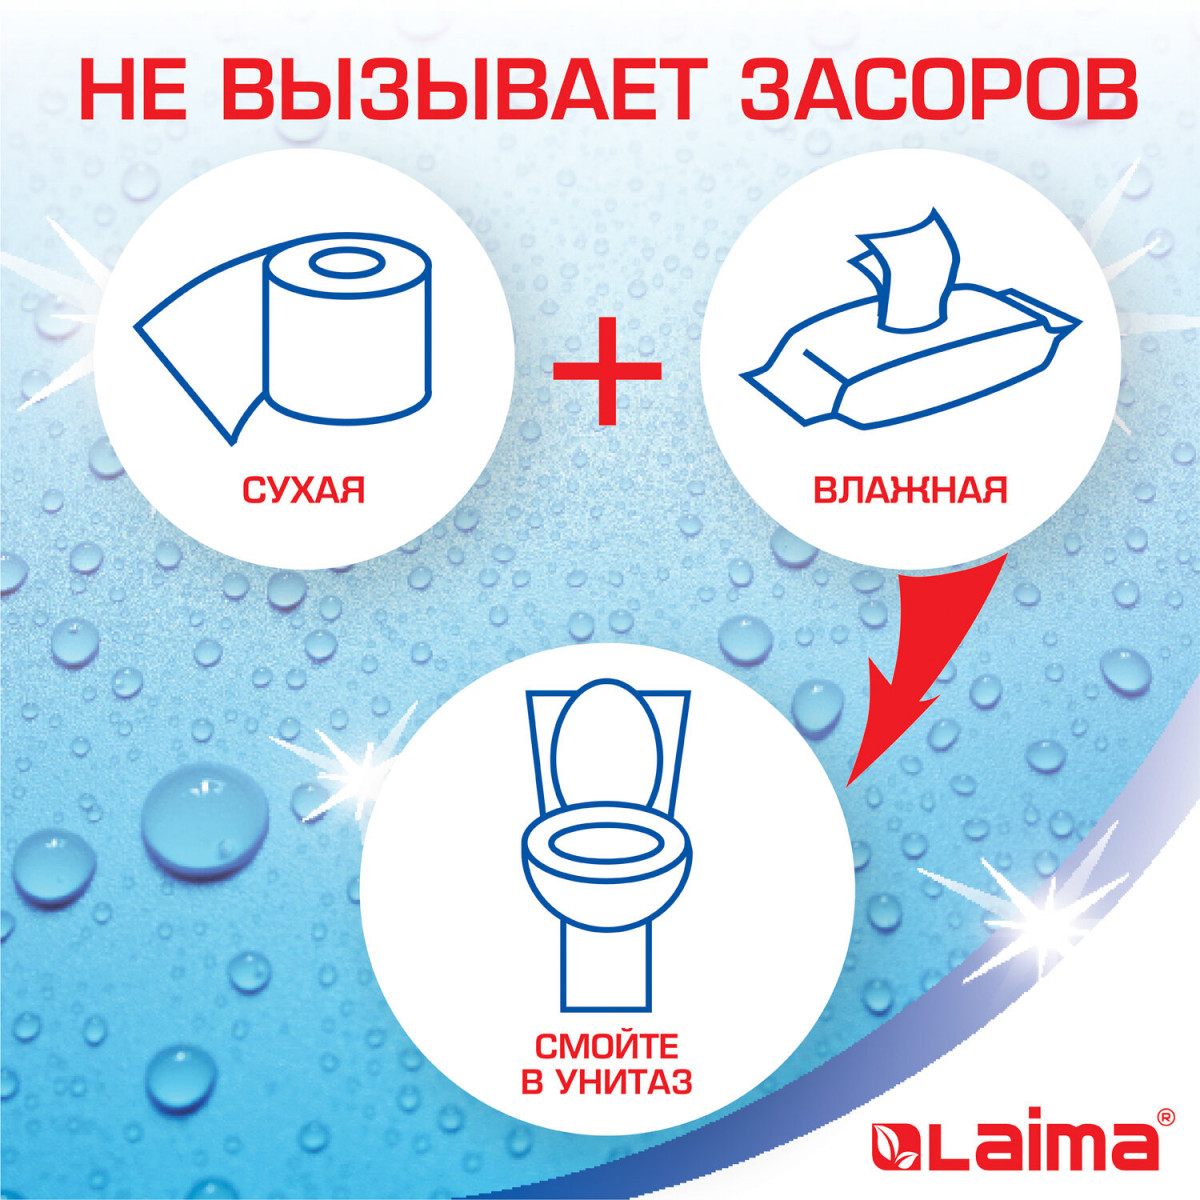 Бумага туалетная влажная 30 шт., LAIMA/ЛАЙМА, деликатный уход, с экстрактом алоэ, без спирта, 128082 (арт. 128082)